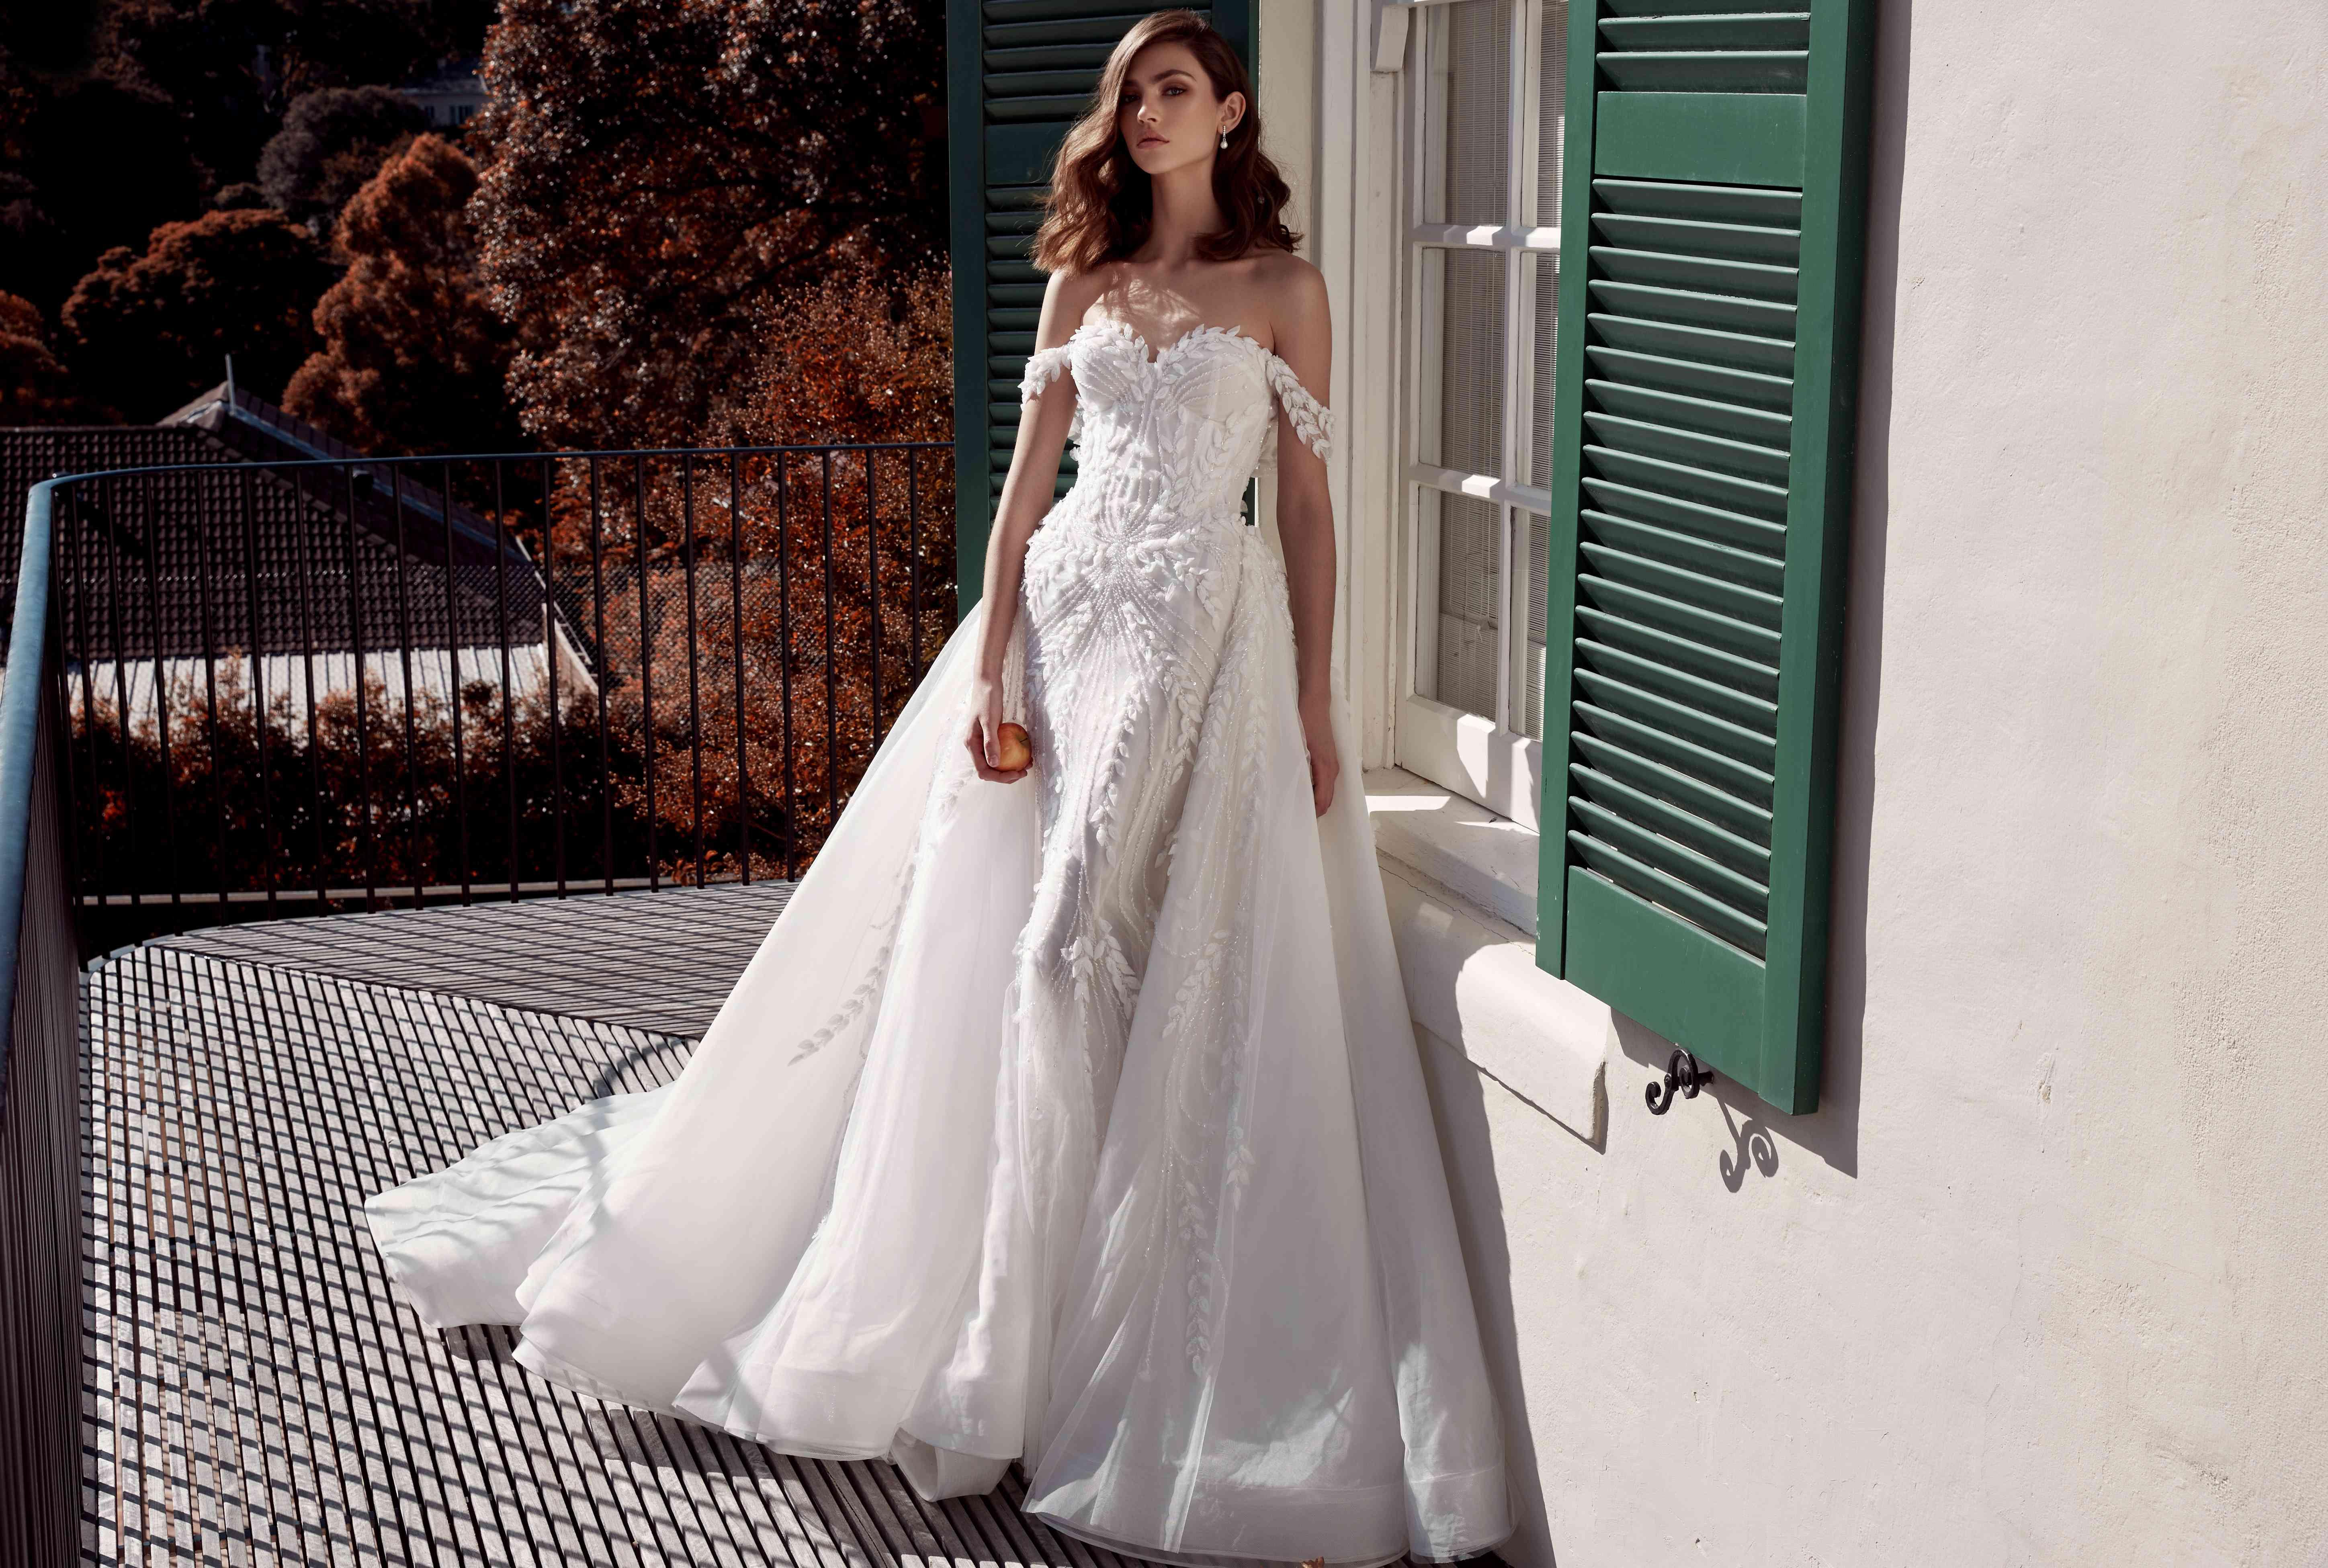 Leah Da Gloria Couture Bridal & Wedding Dress Collection Fall 20